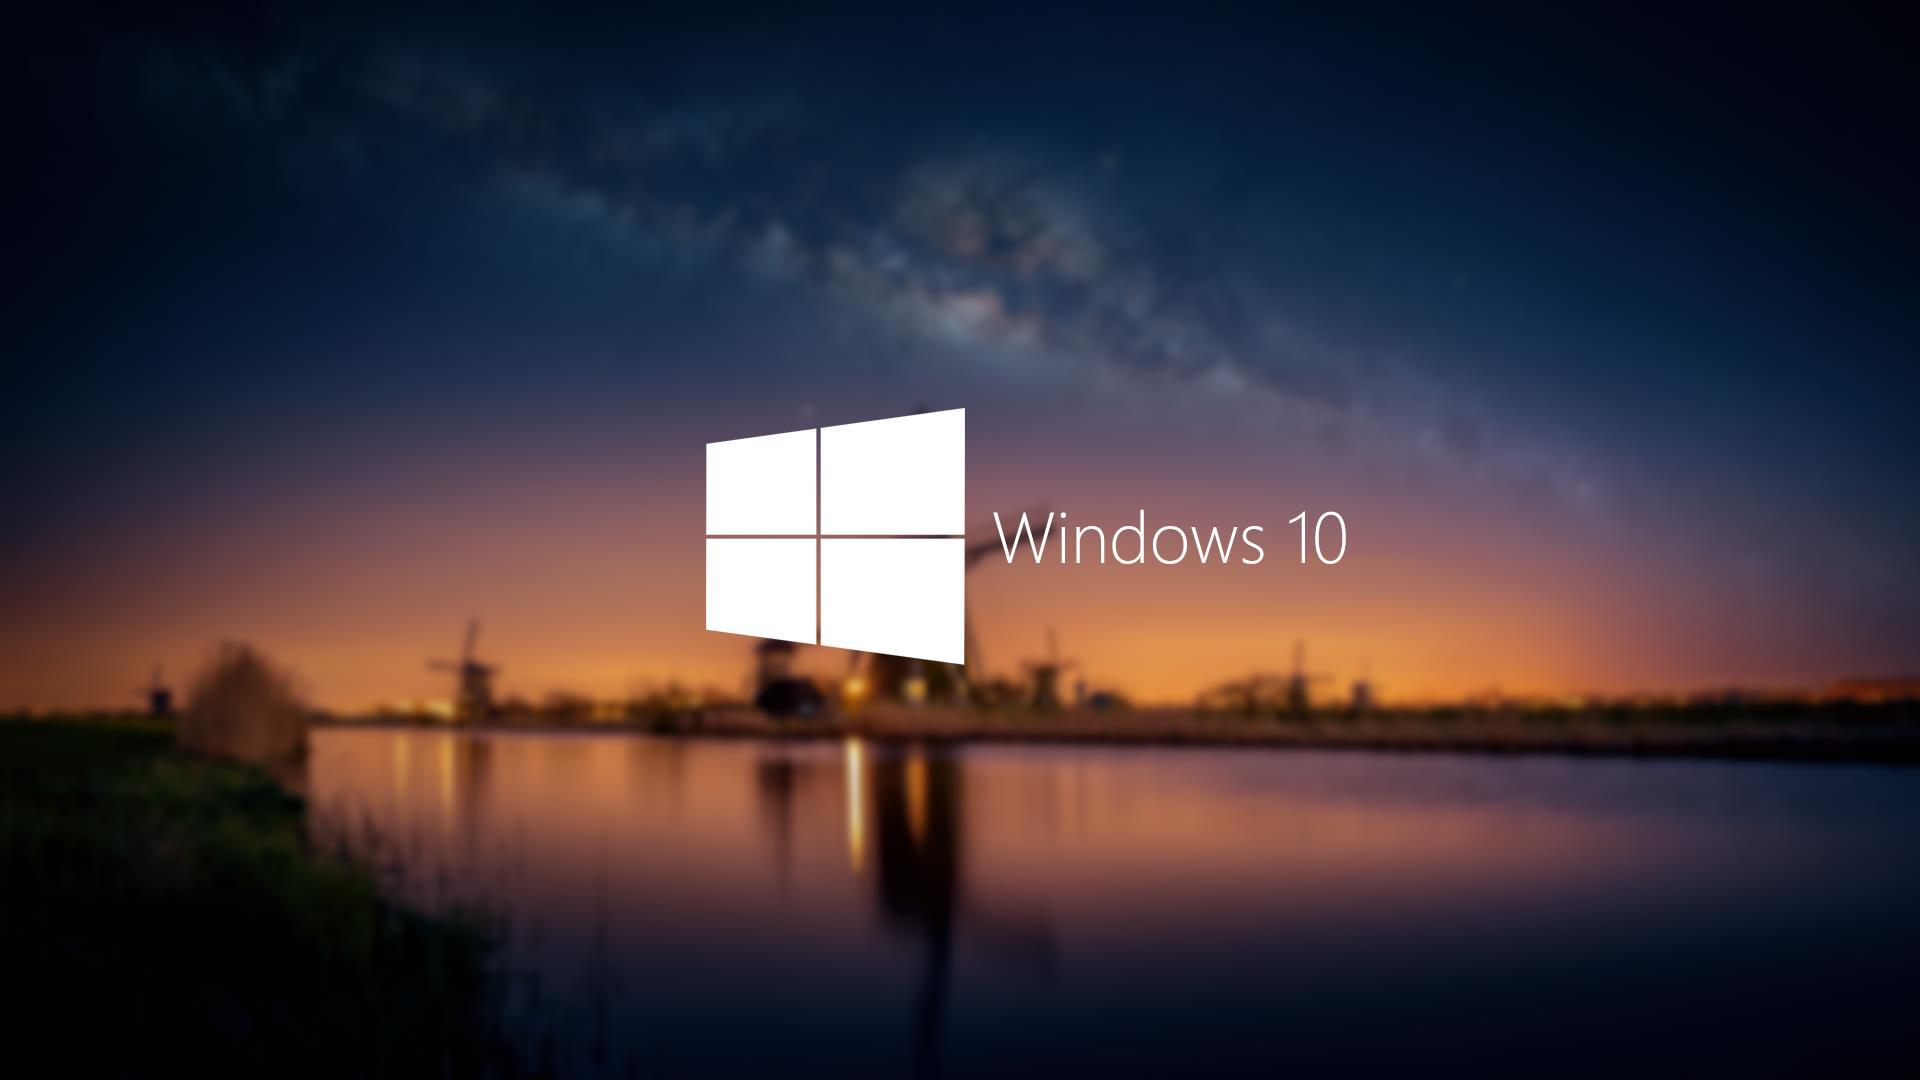 ?u=https%3A%2F%2Fsguru.org%2Fwp content%2Fuploads%2F2017%2F03%2FWindows 10 Wallpaper 1440x900 1 - Windows 10 Tüm Sürümler